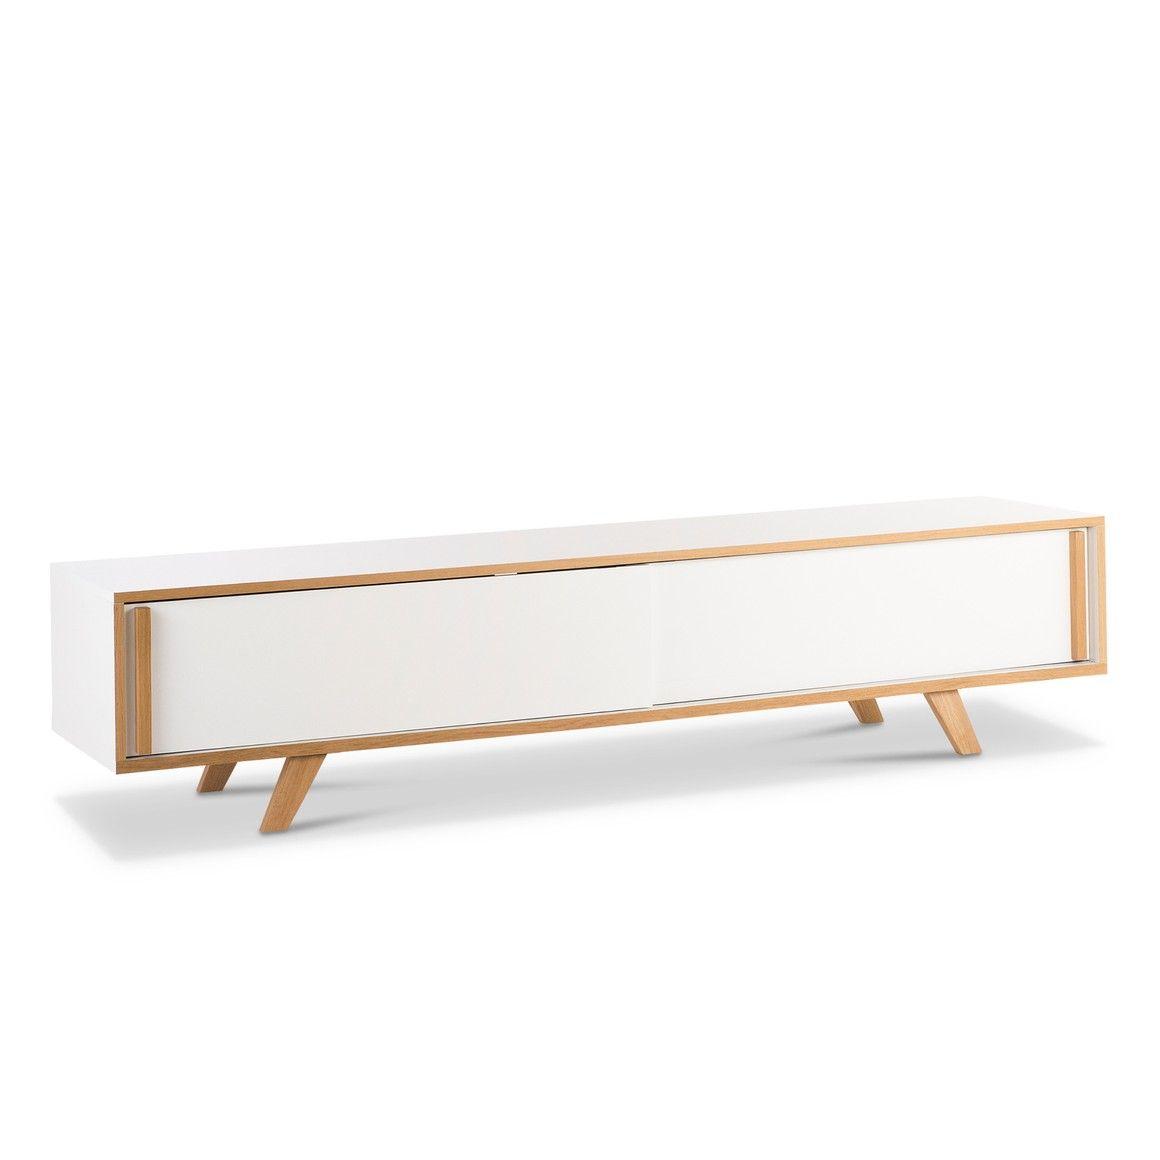 Meuble Tv Blanc Et Chene A Portes Coulissantes Malte Blanc Chene 14134000 0 Tv Mobel Design Online Bestellen